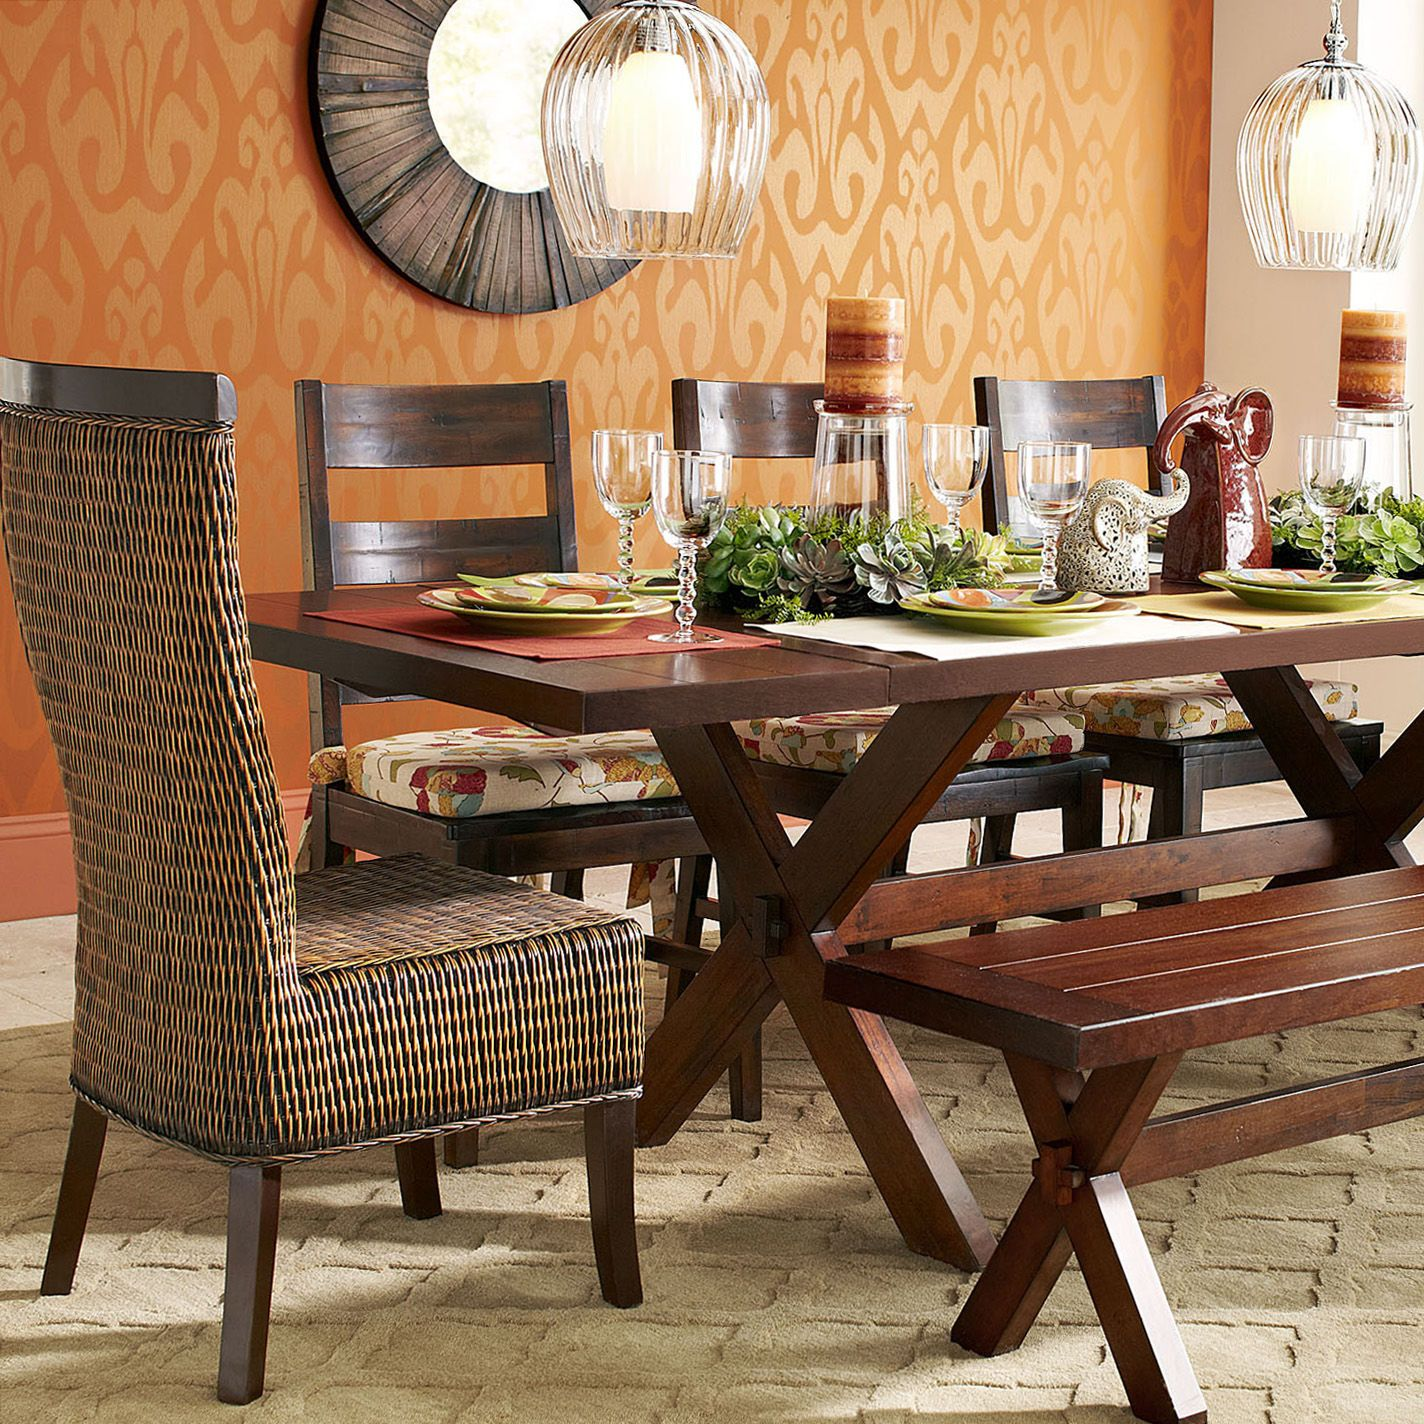 Marvelous Lurik Dining Chair Pier 1 Dining Room Furniture Creativecarmelina Interior Chair Design Creativecarmelinacom